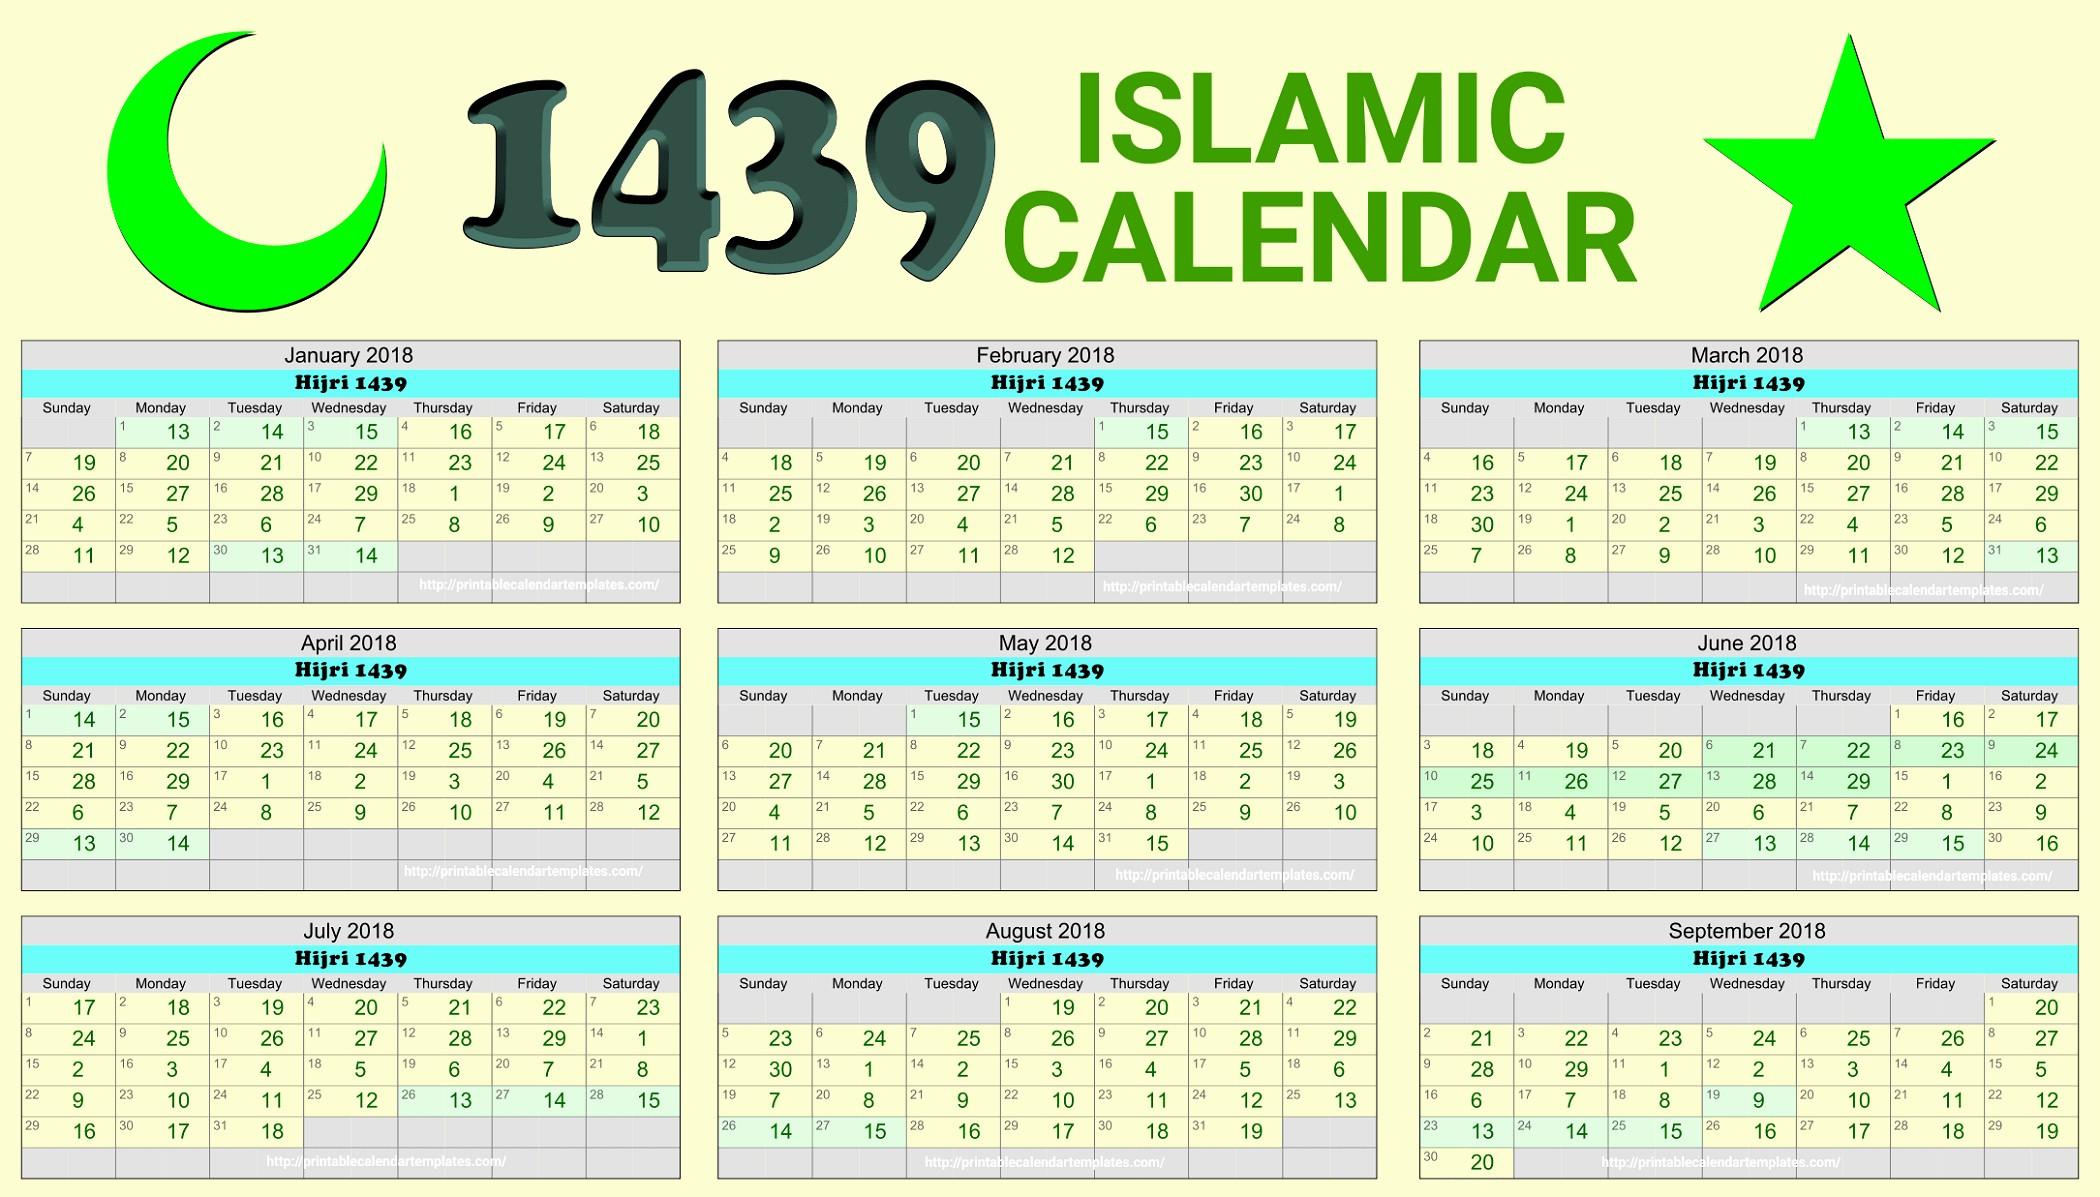 Islamic Calendar 2018 Uk Kalendar islam 2018 2 2018 Calendar Printable for Free Download India Usa